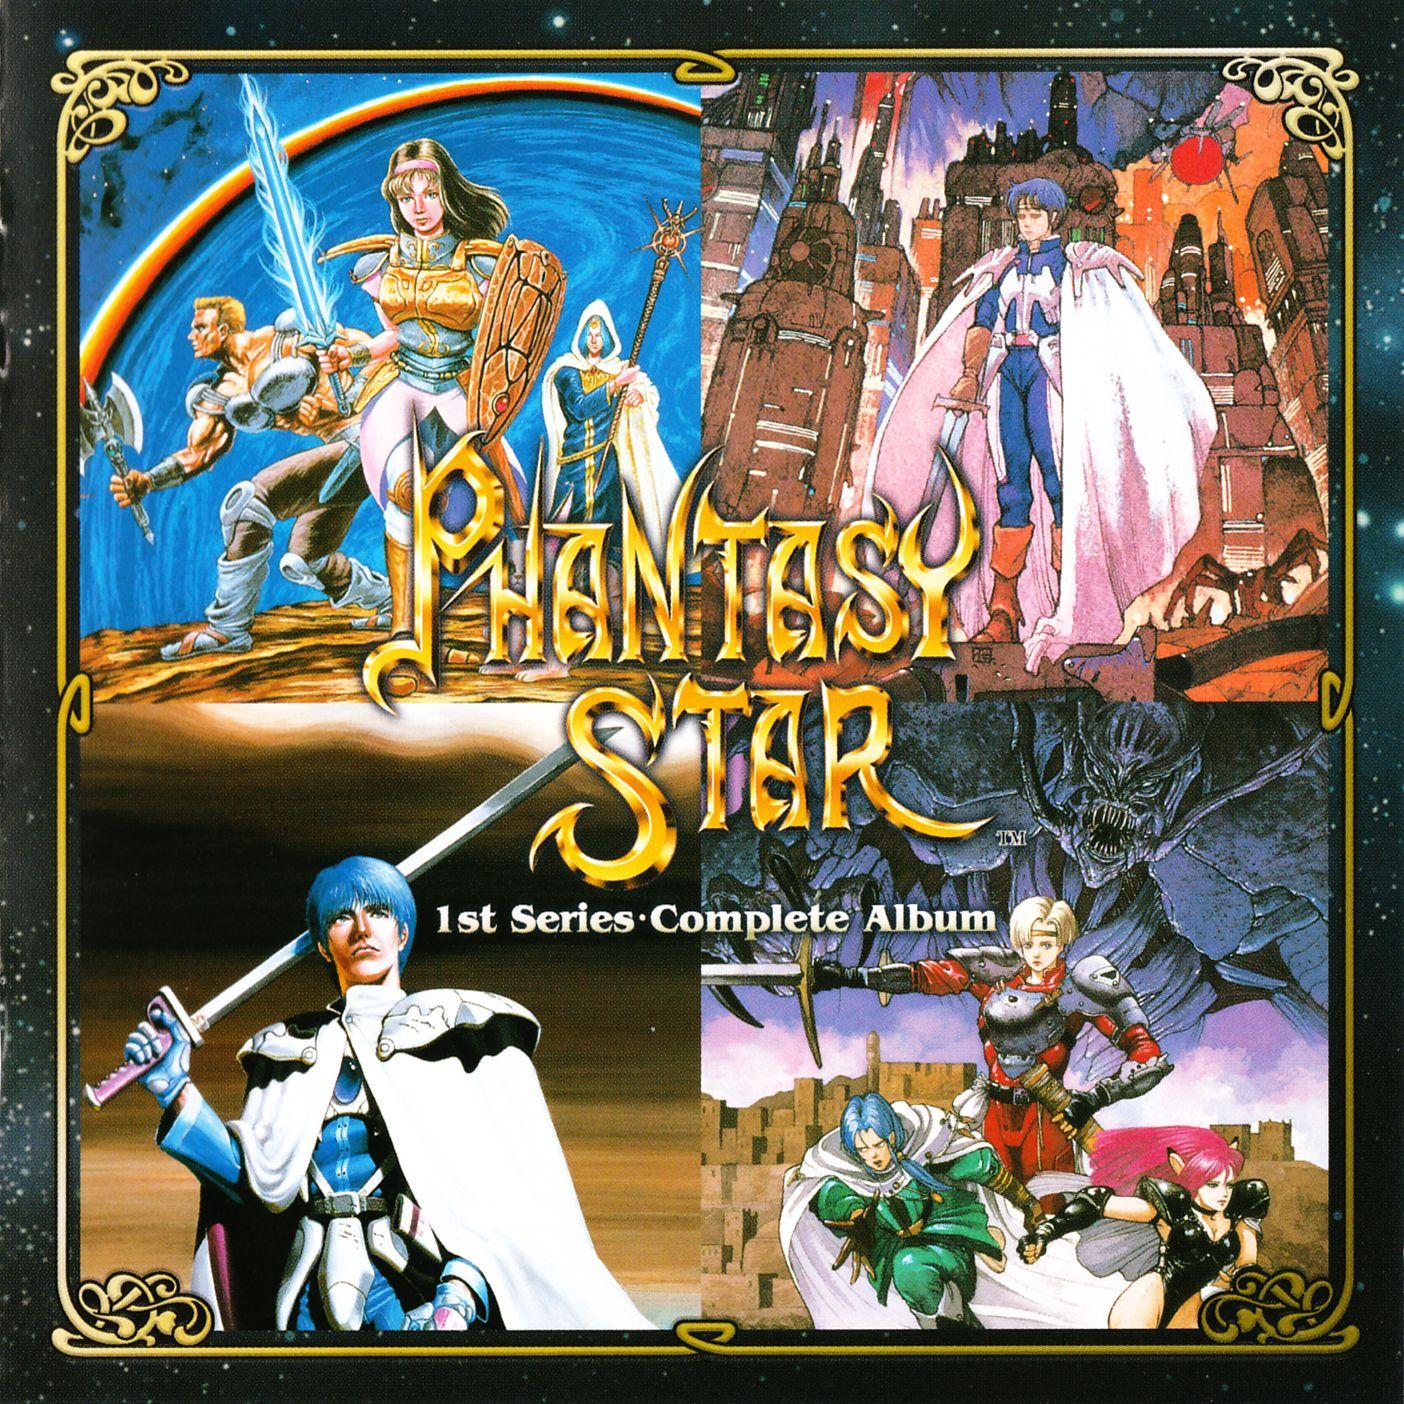 Phantasy Star 4 World Map.Phantasy Star 1st Series Complete Album Soundtrack From Phantasy